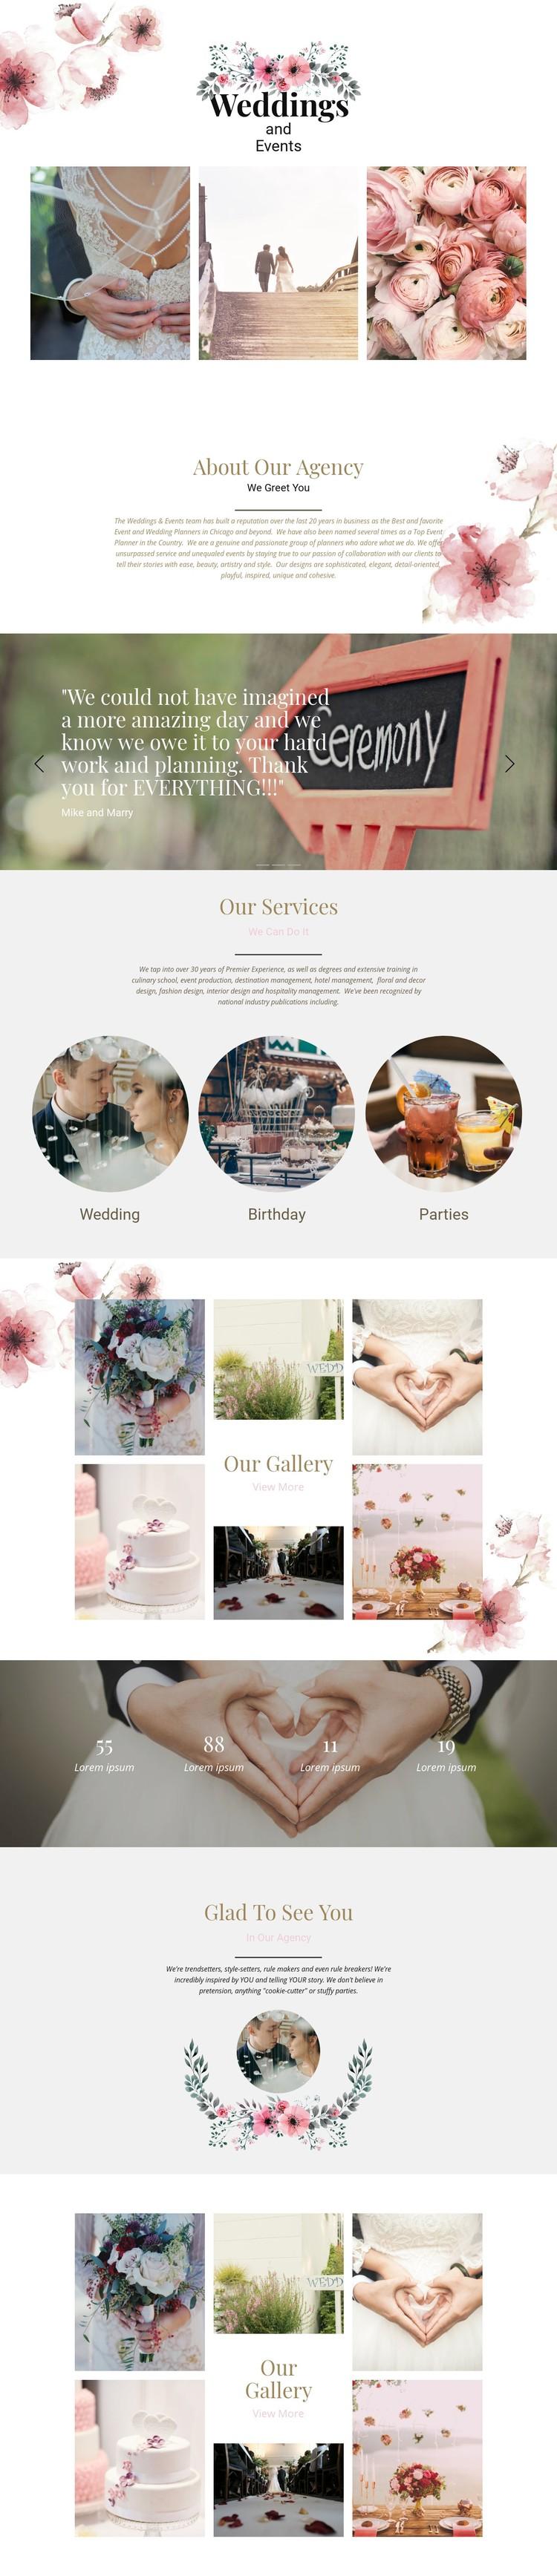 Moments of wedding Website Creator